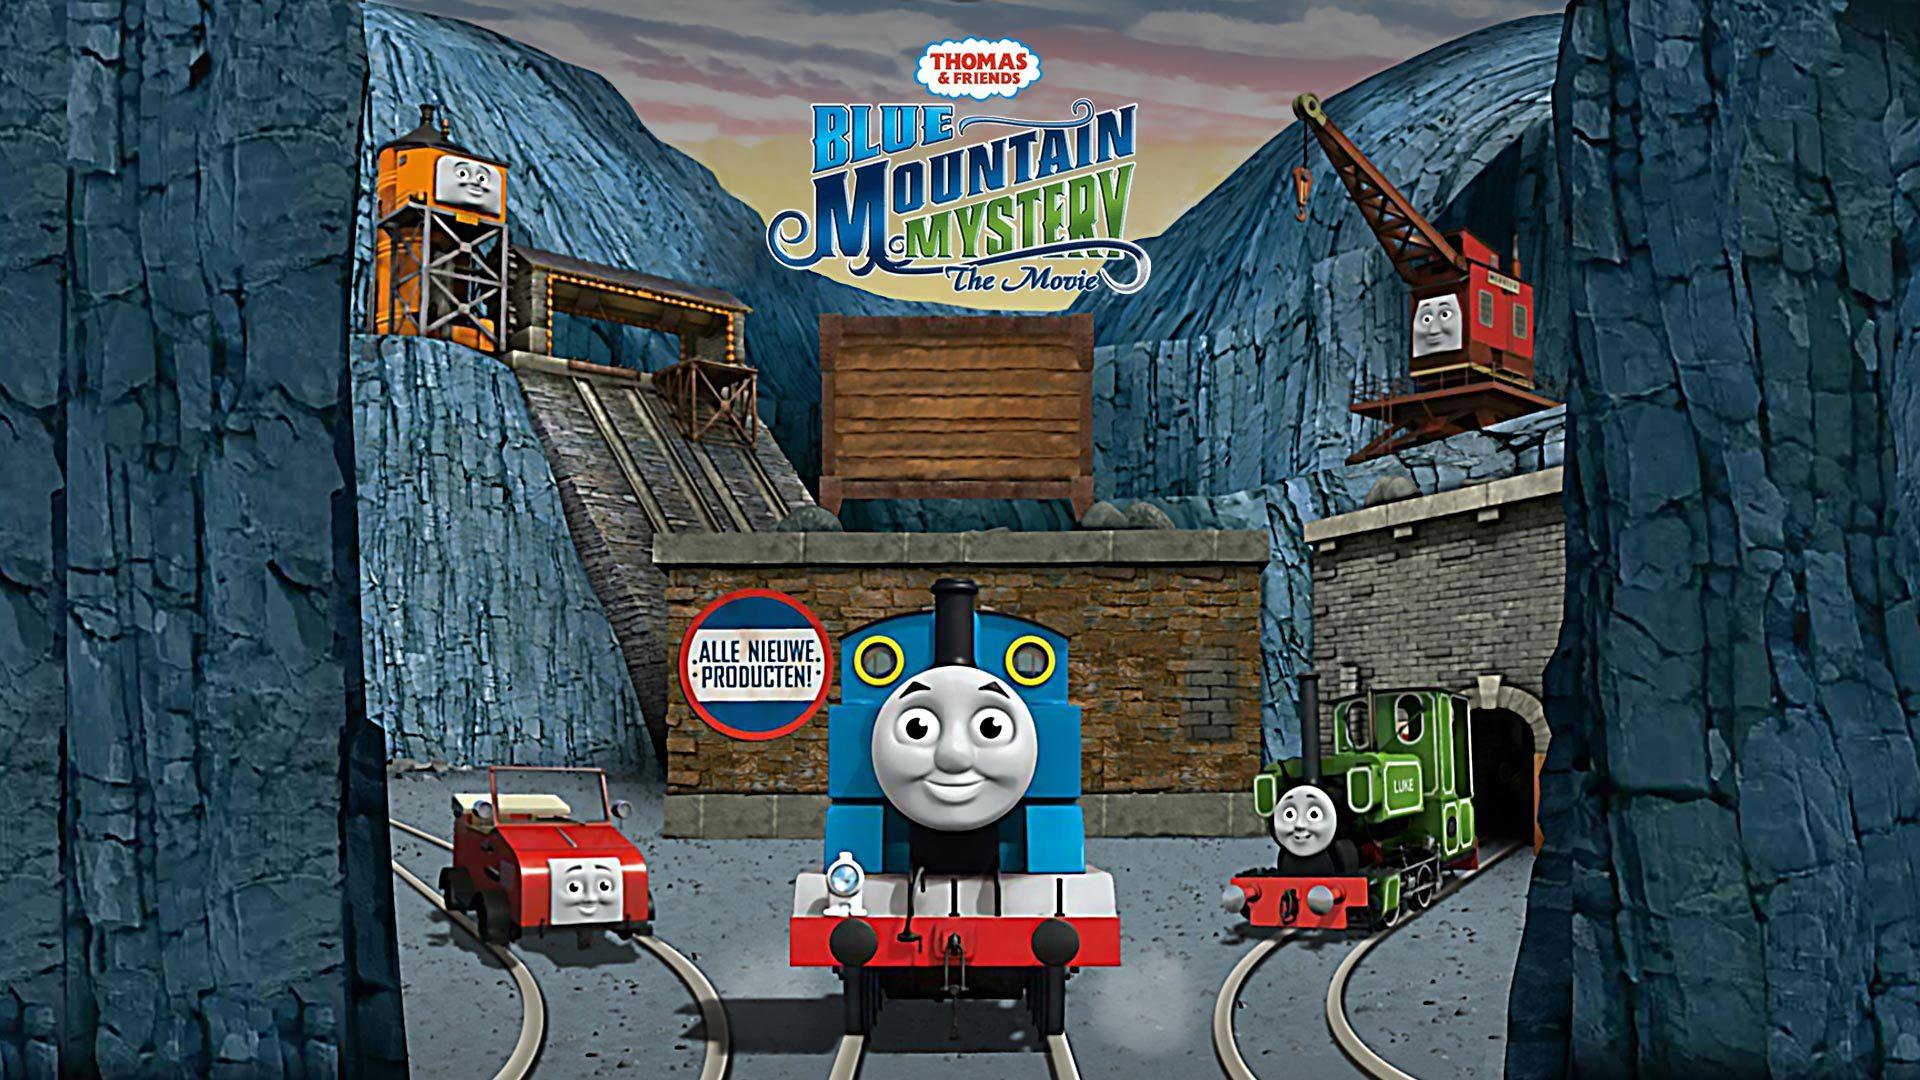 Thomas & Friends: Blue Mountain Mystery The Movie